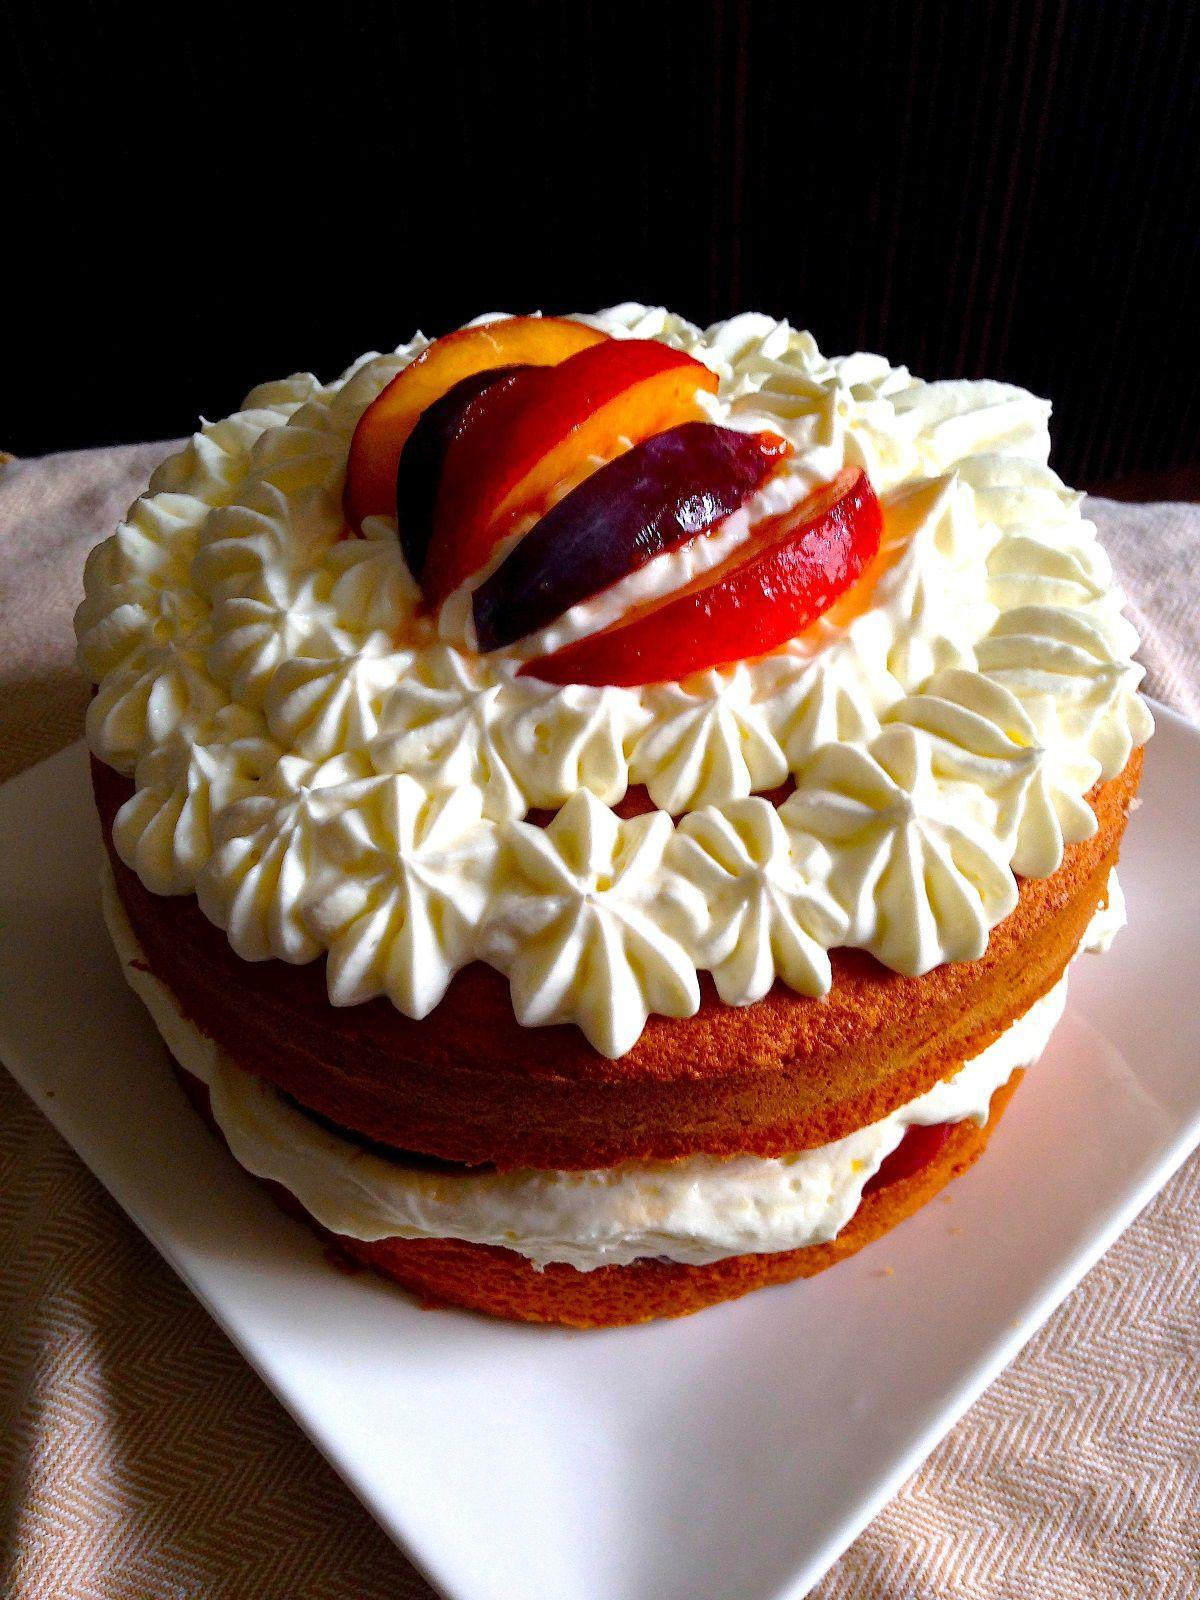 Summer Chiffon Cake with Cream